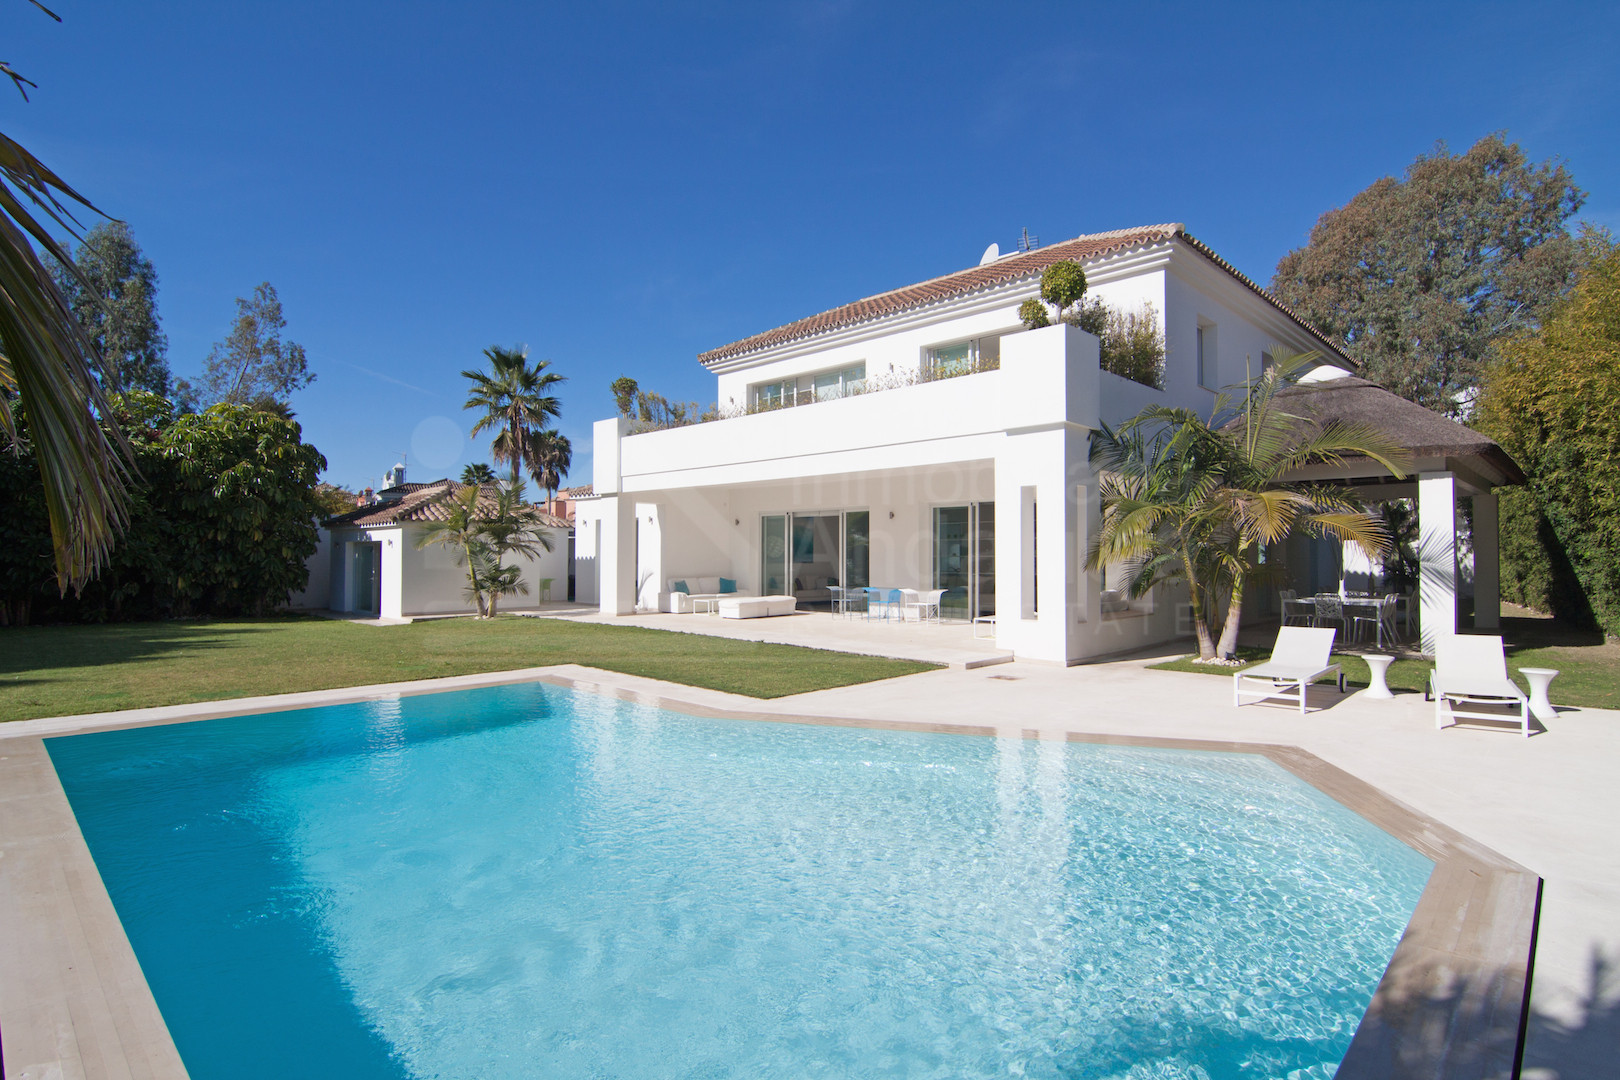 5 bedroom villa renovated to high modern standard for sale in Casasola Estepona